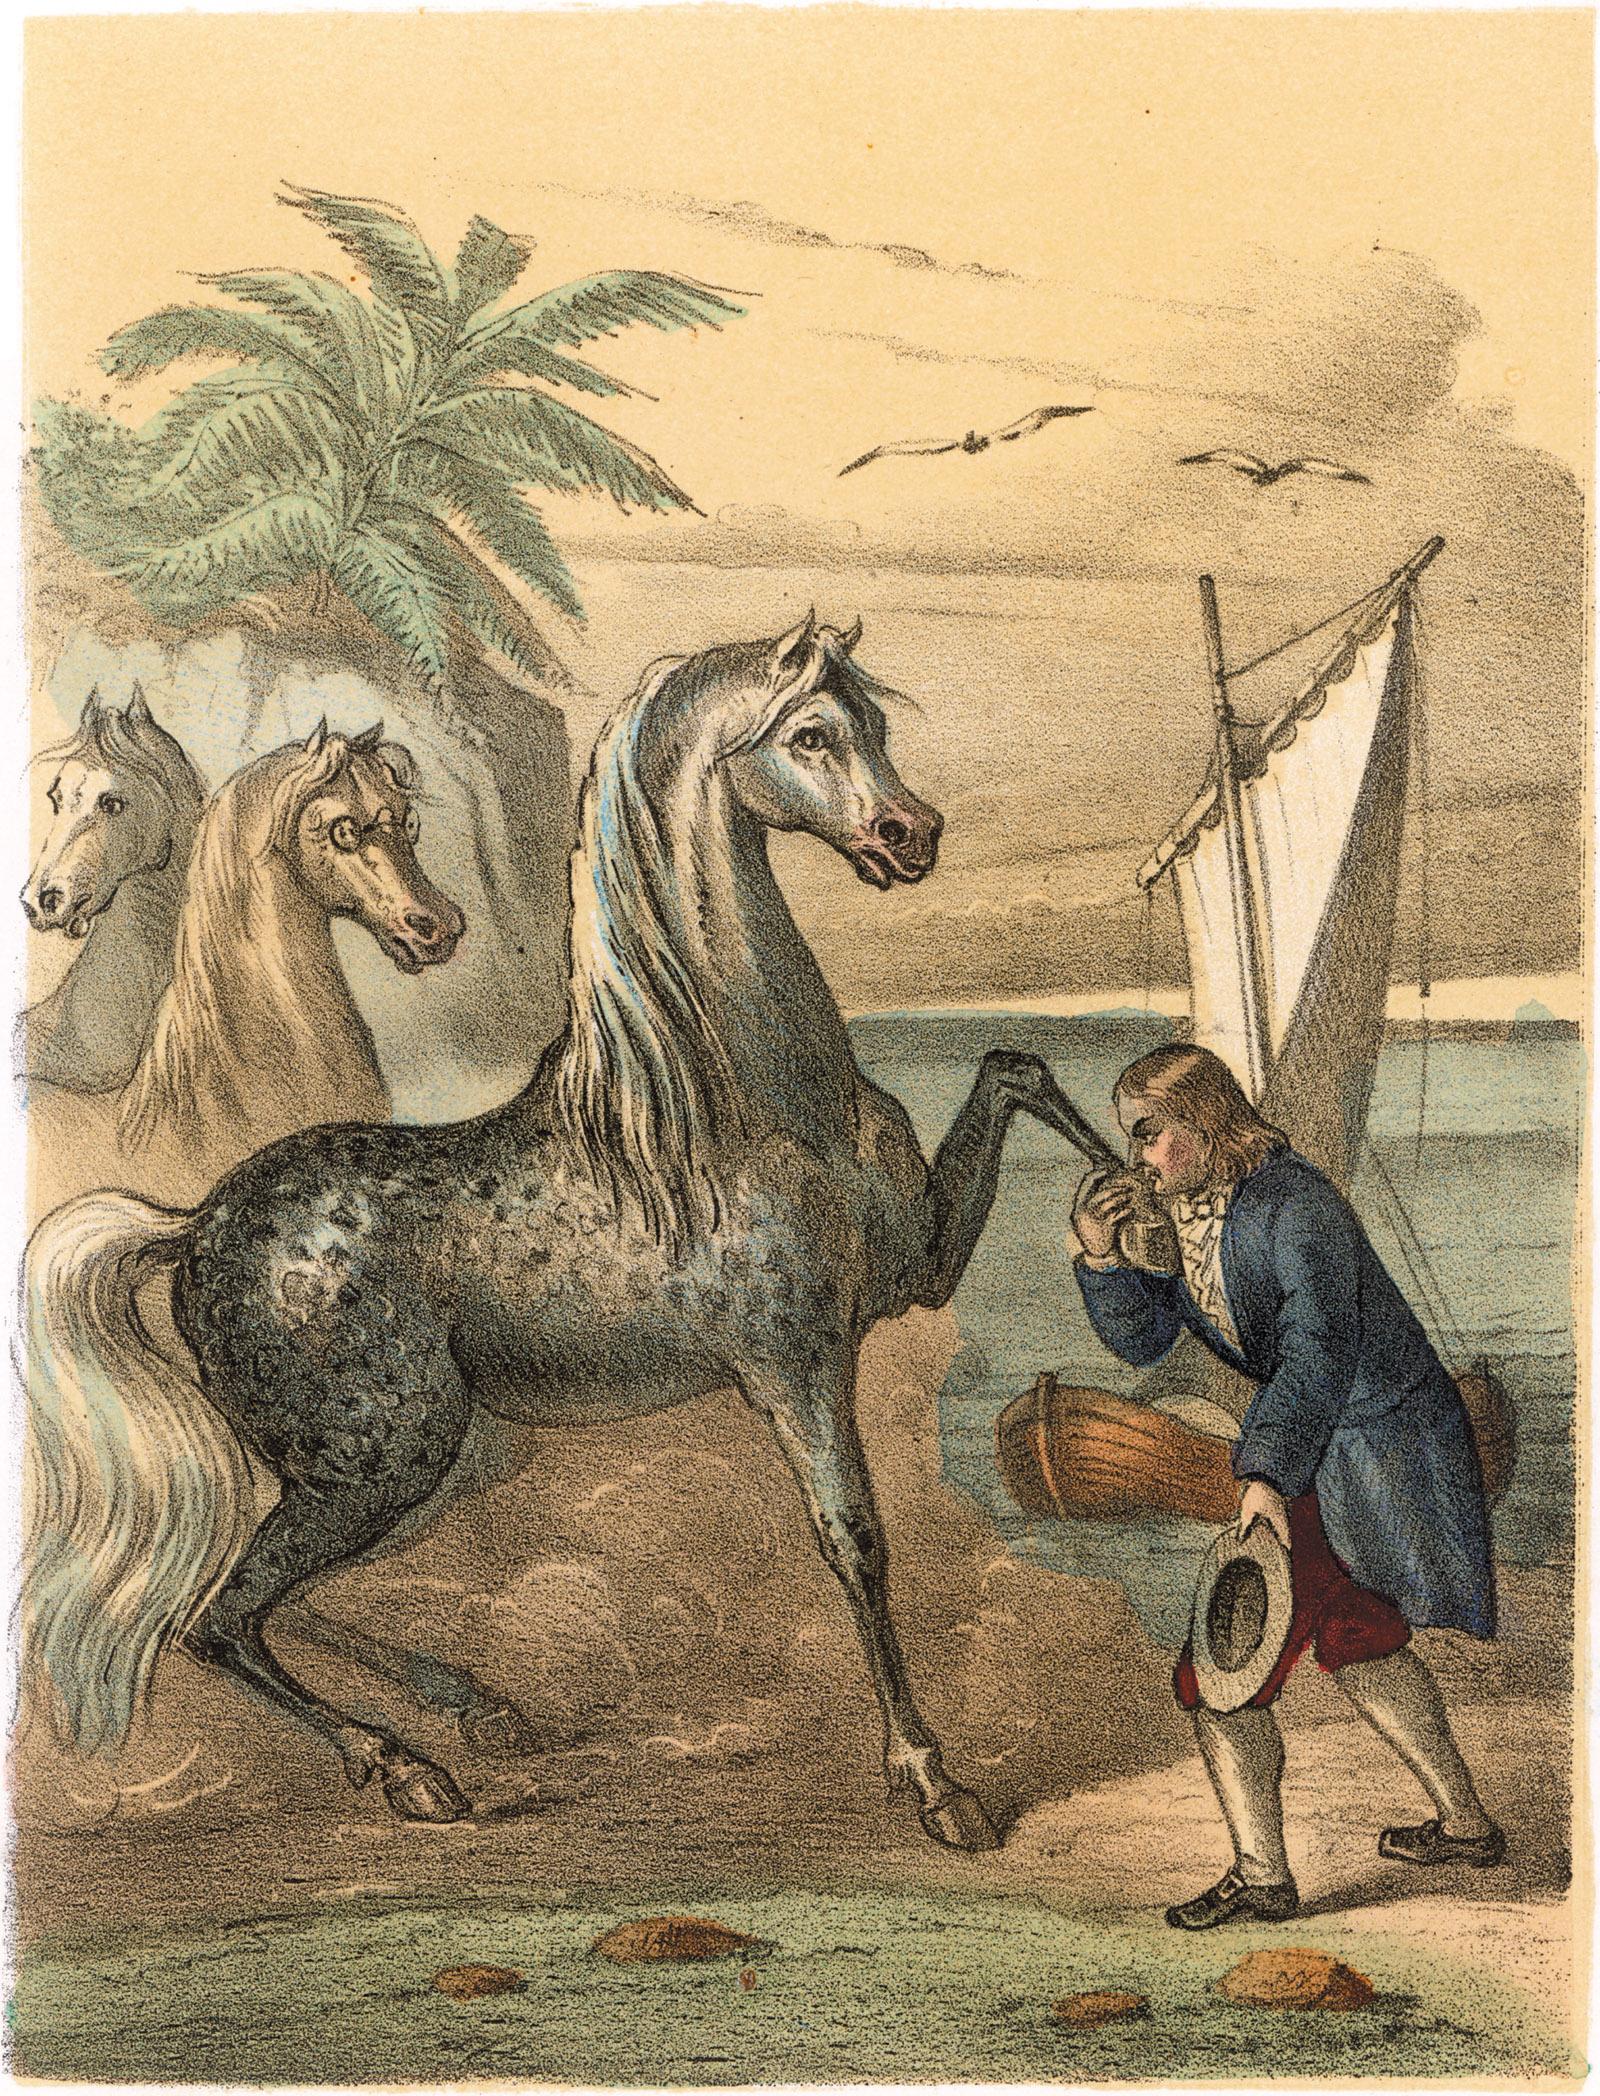 Gulliver leaving Houyhnhnms, illustration from Jonathan Swift's Gulliver's Travels